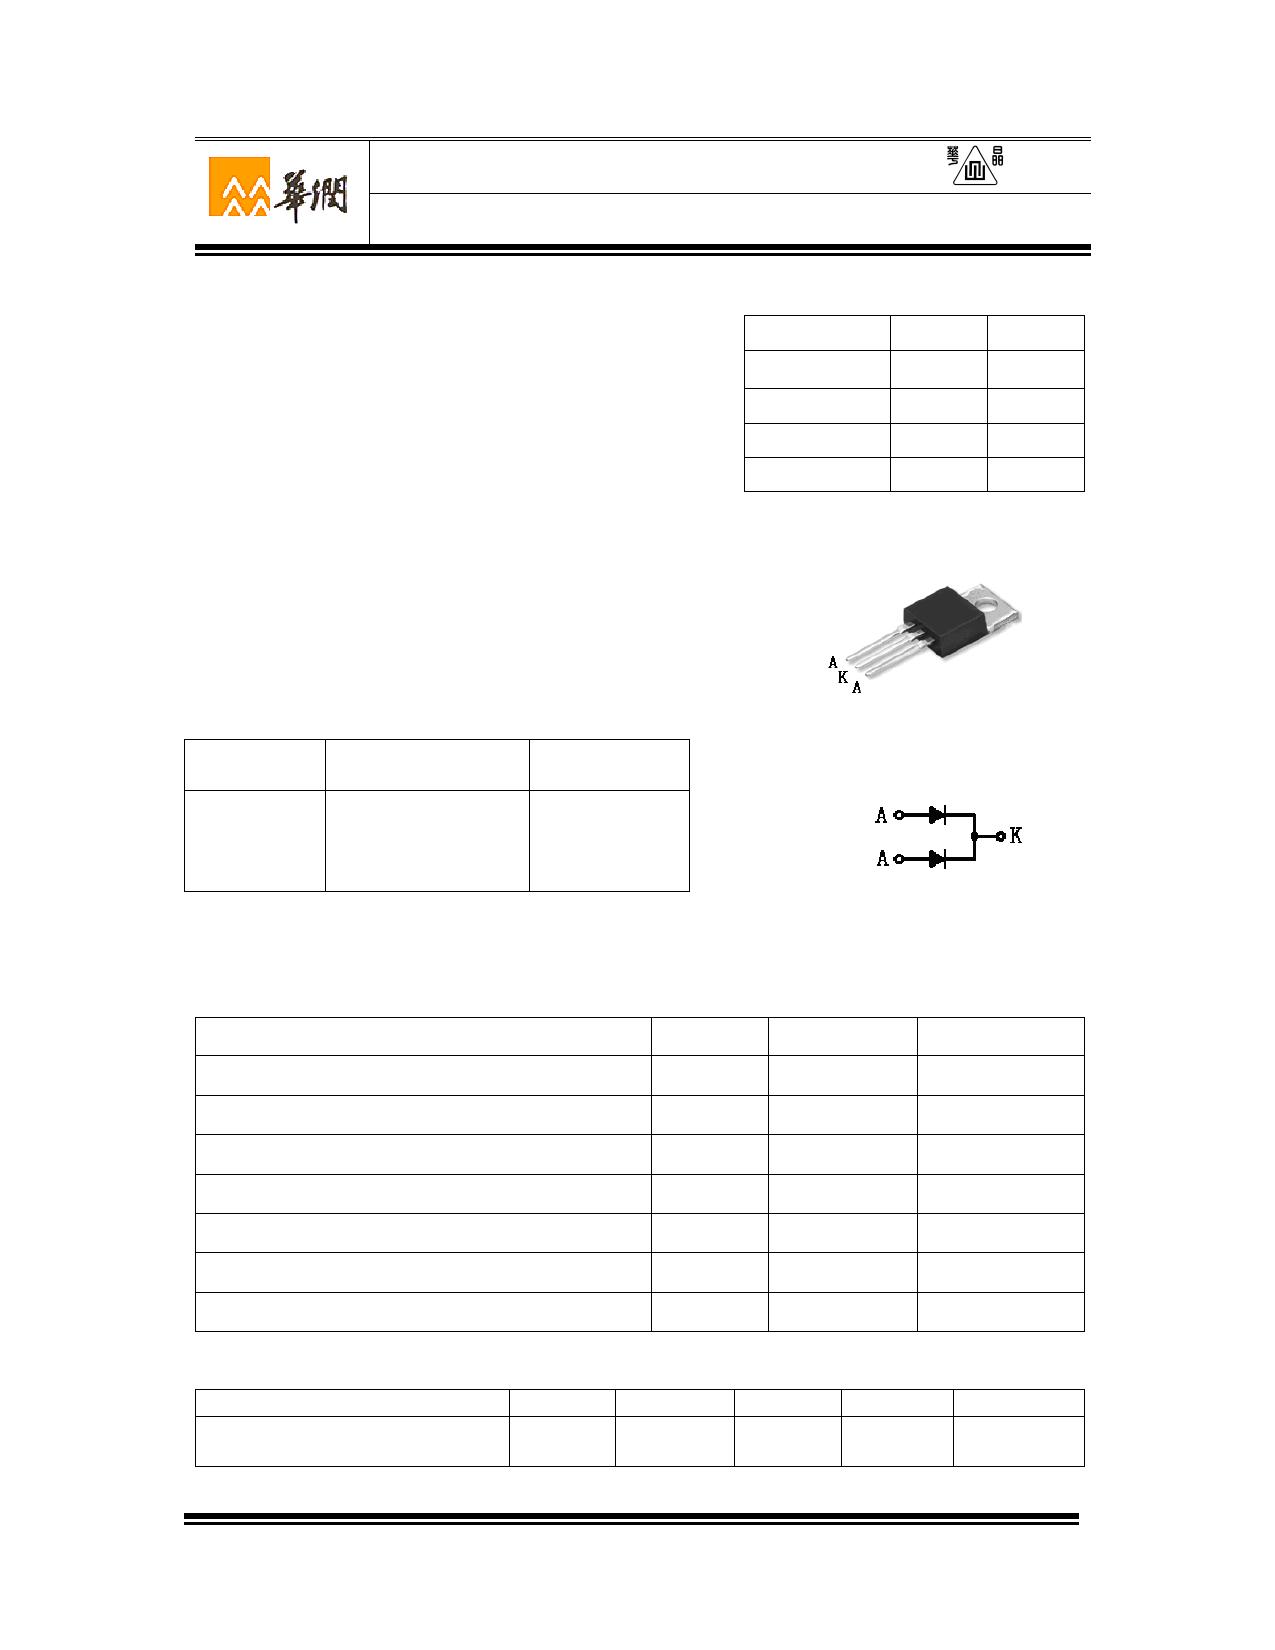 2CR162A8S Datasheet, 2CR162A8S PDF,ピン配置, 機能